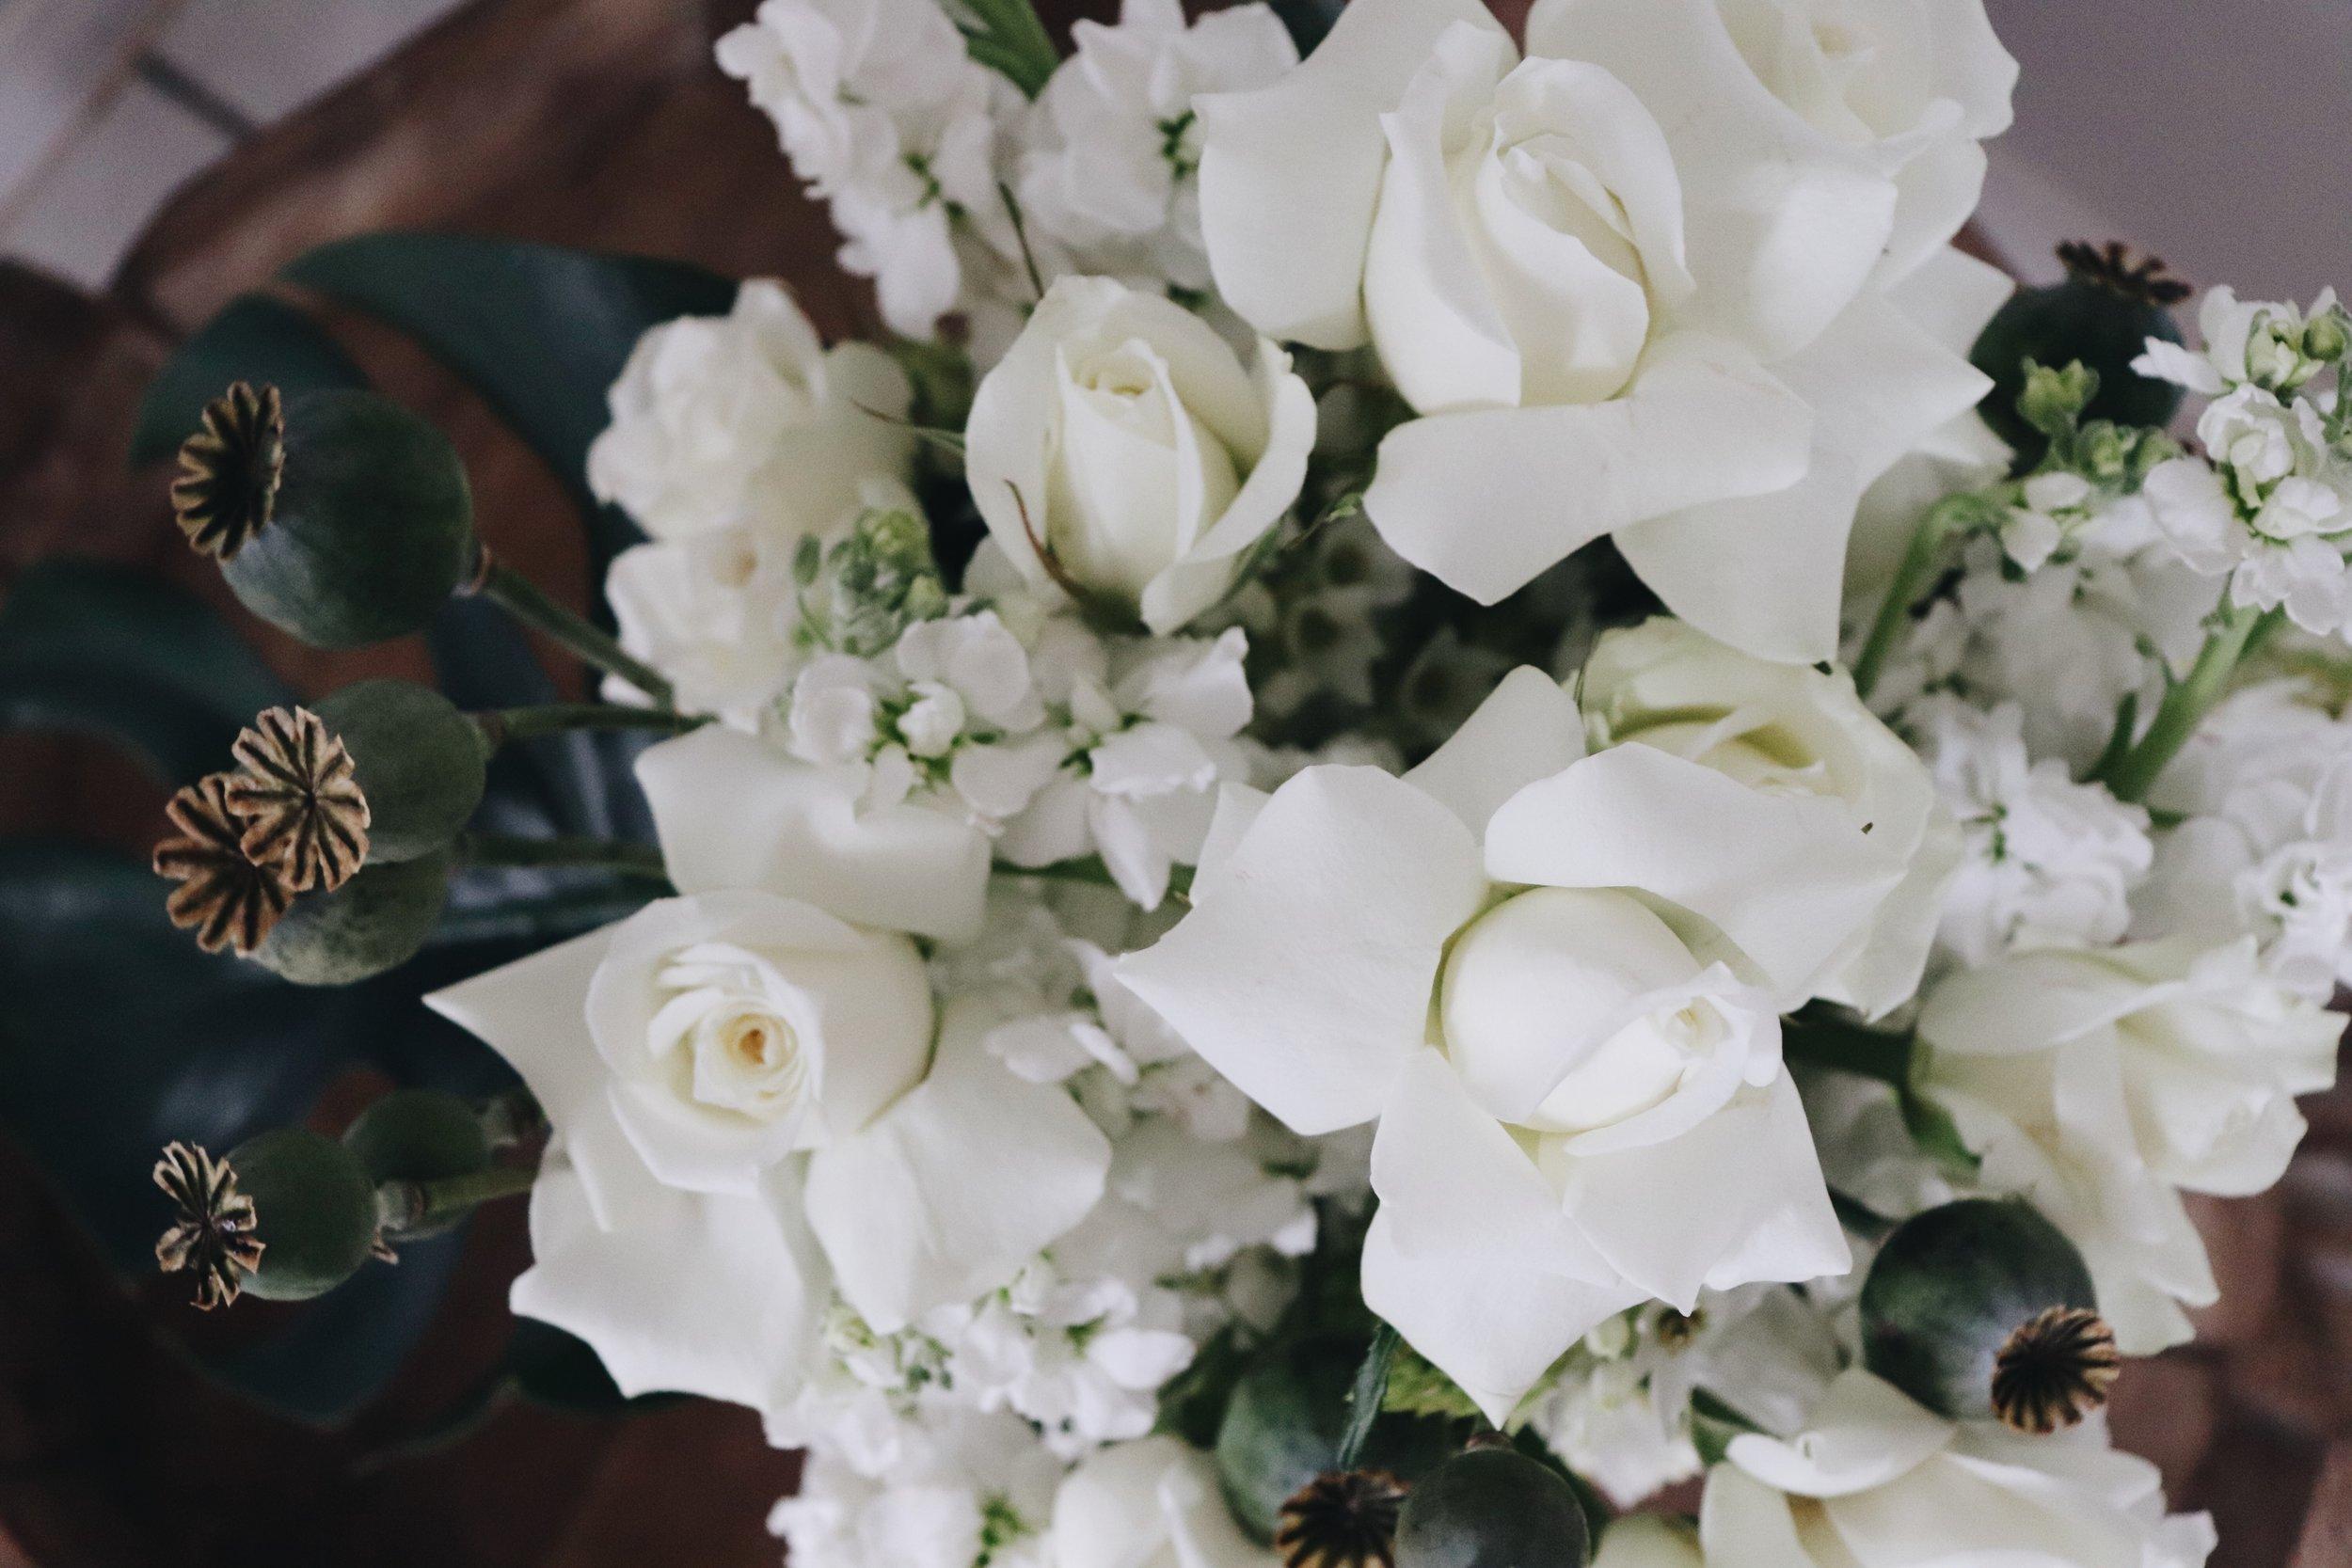 cairns_eventplanner_crystalcaves_style_weddings_design_portdouglas_weddingstylist_weddingflowerscairns_stylist_queensland_roses_thecollectionco_weddingphotographer.JPG